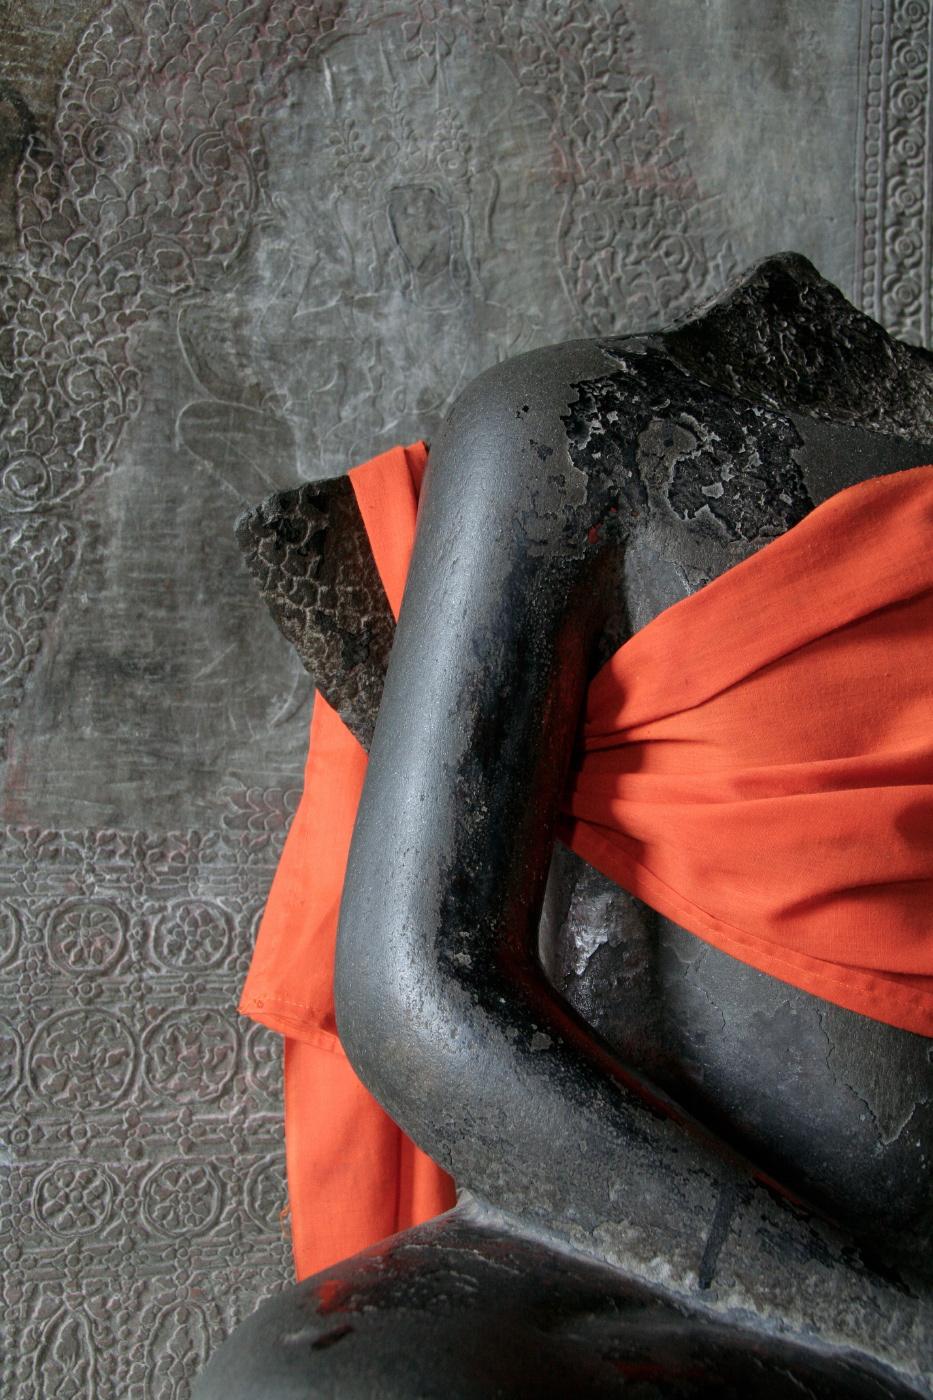 Buddha figure, ngkor Wat, Cambodia